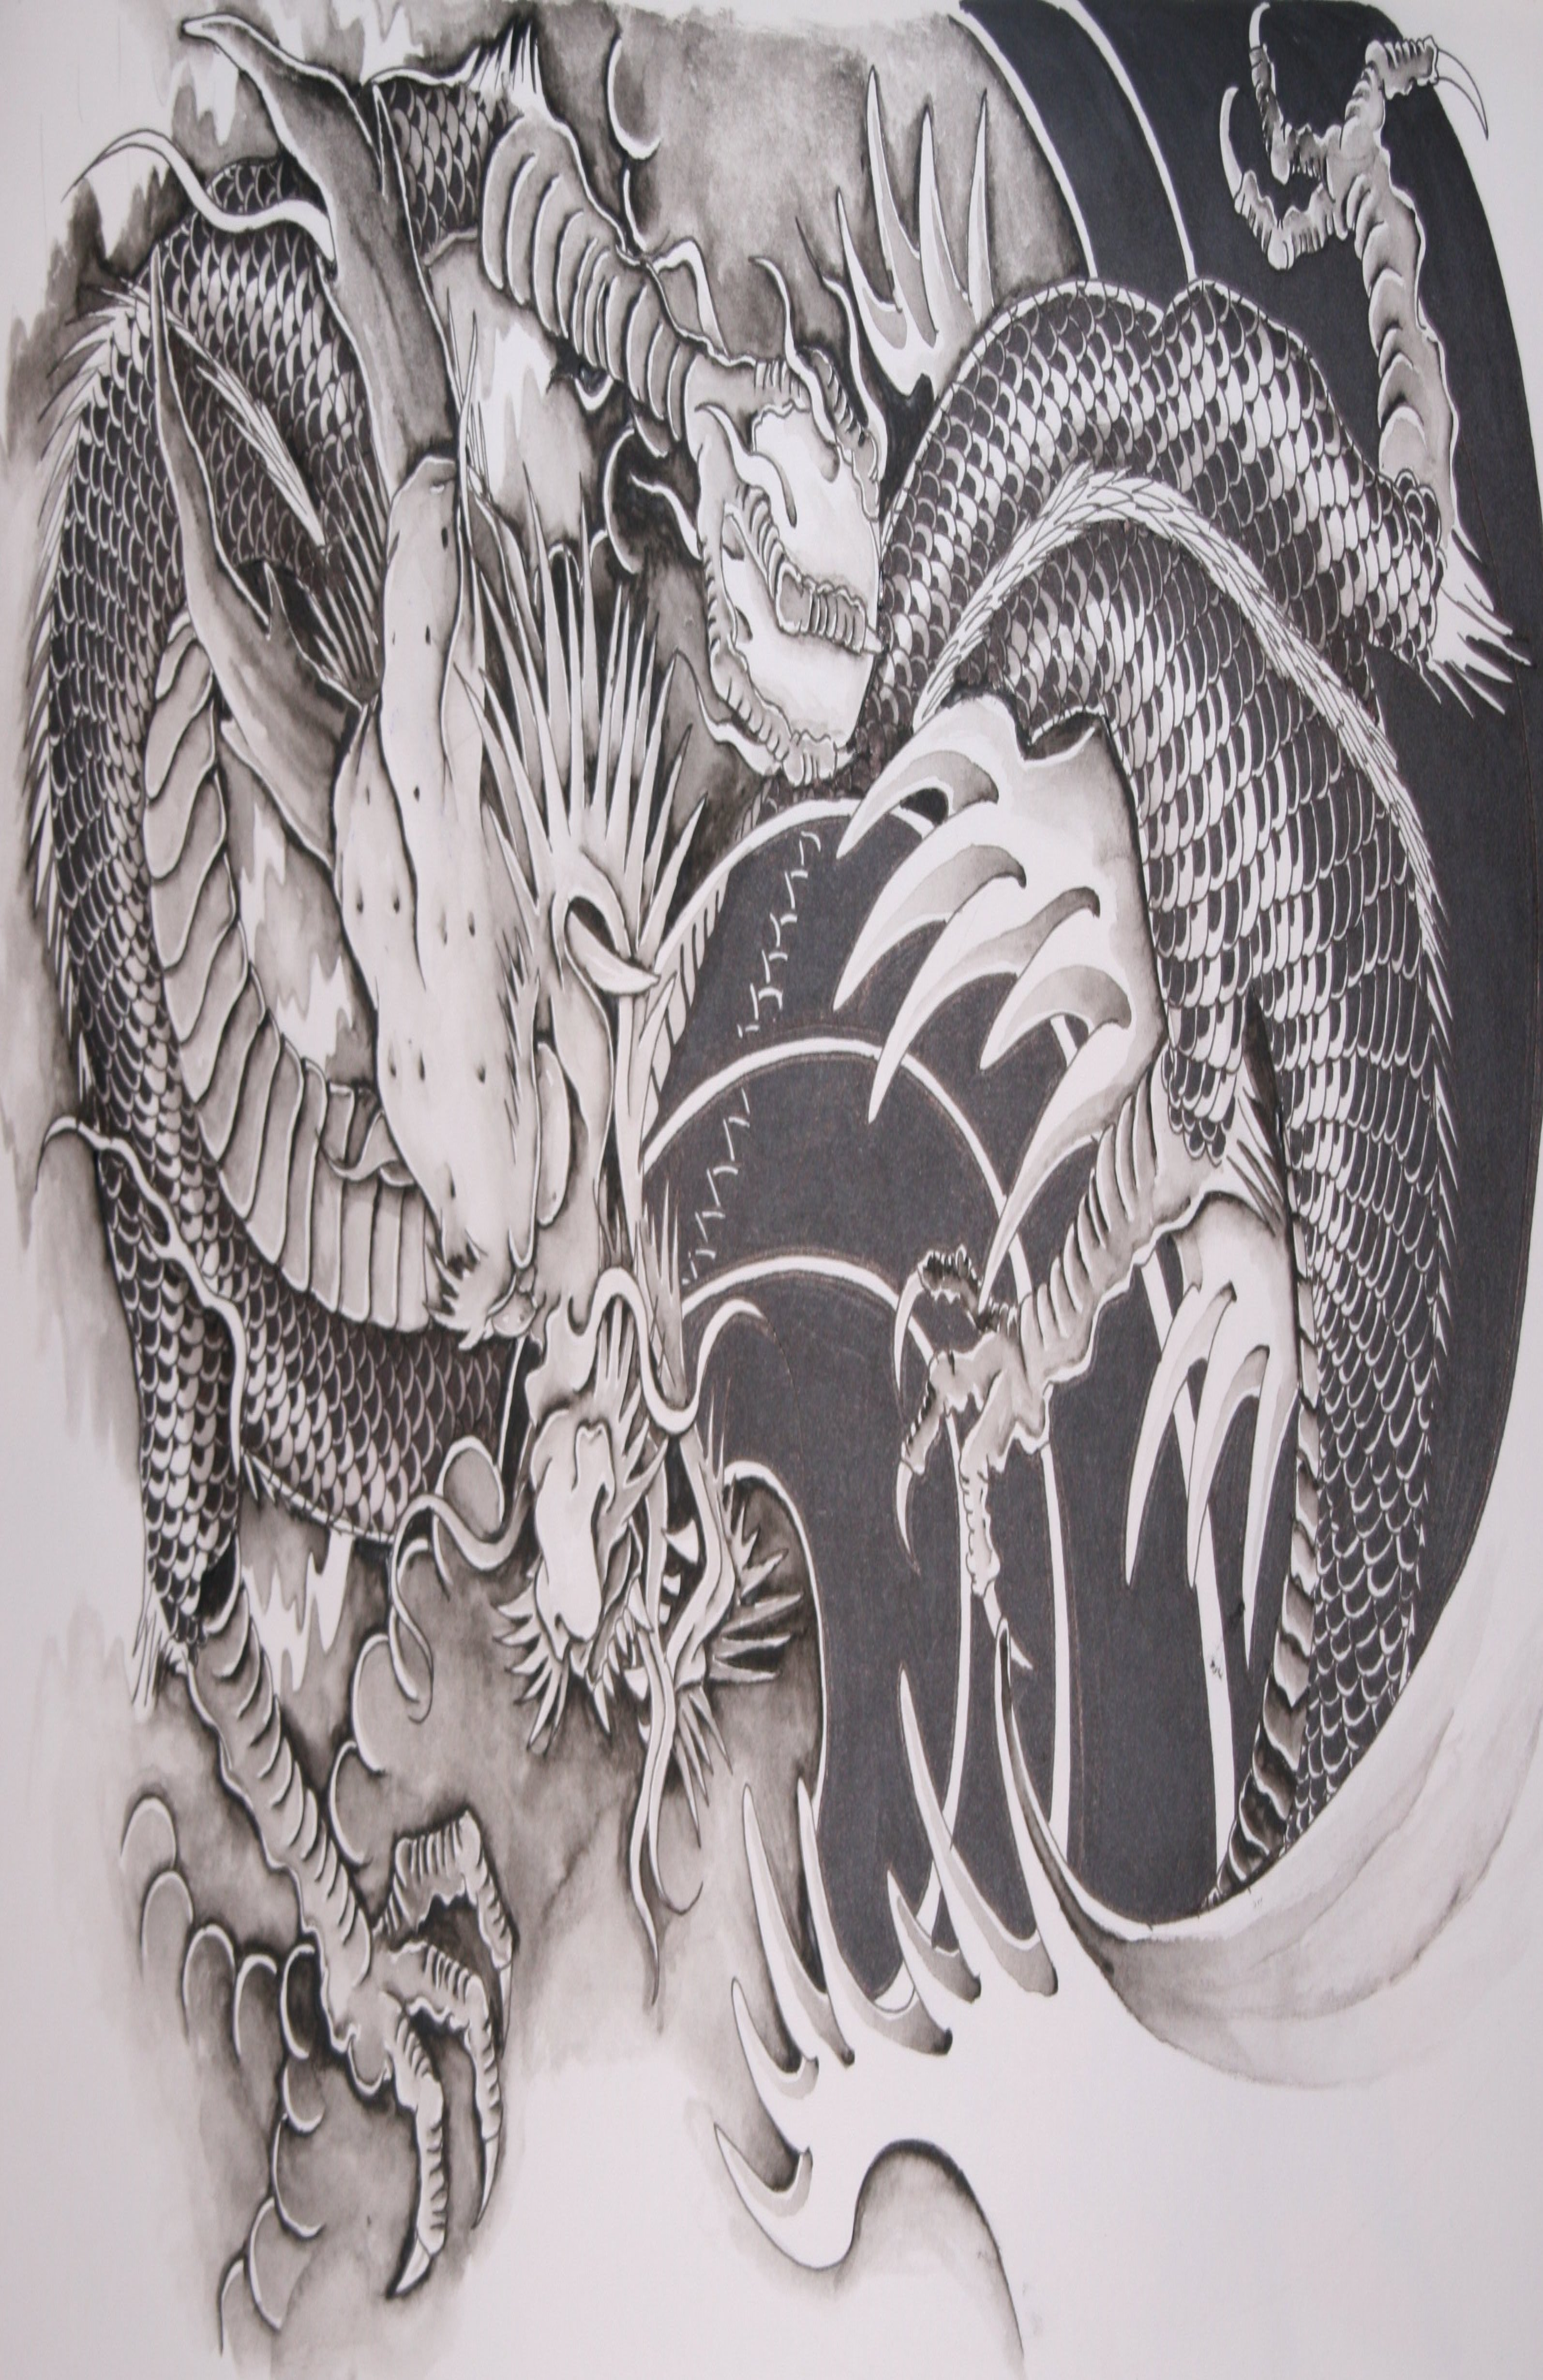 Chinese Dragon Tattoo wallpaper 82665 2067x3189